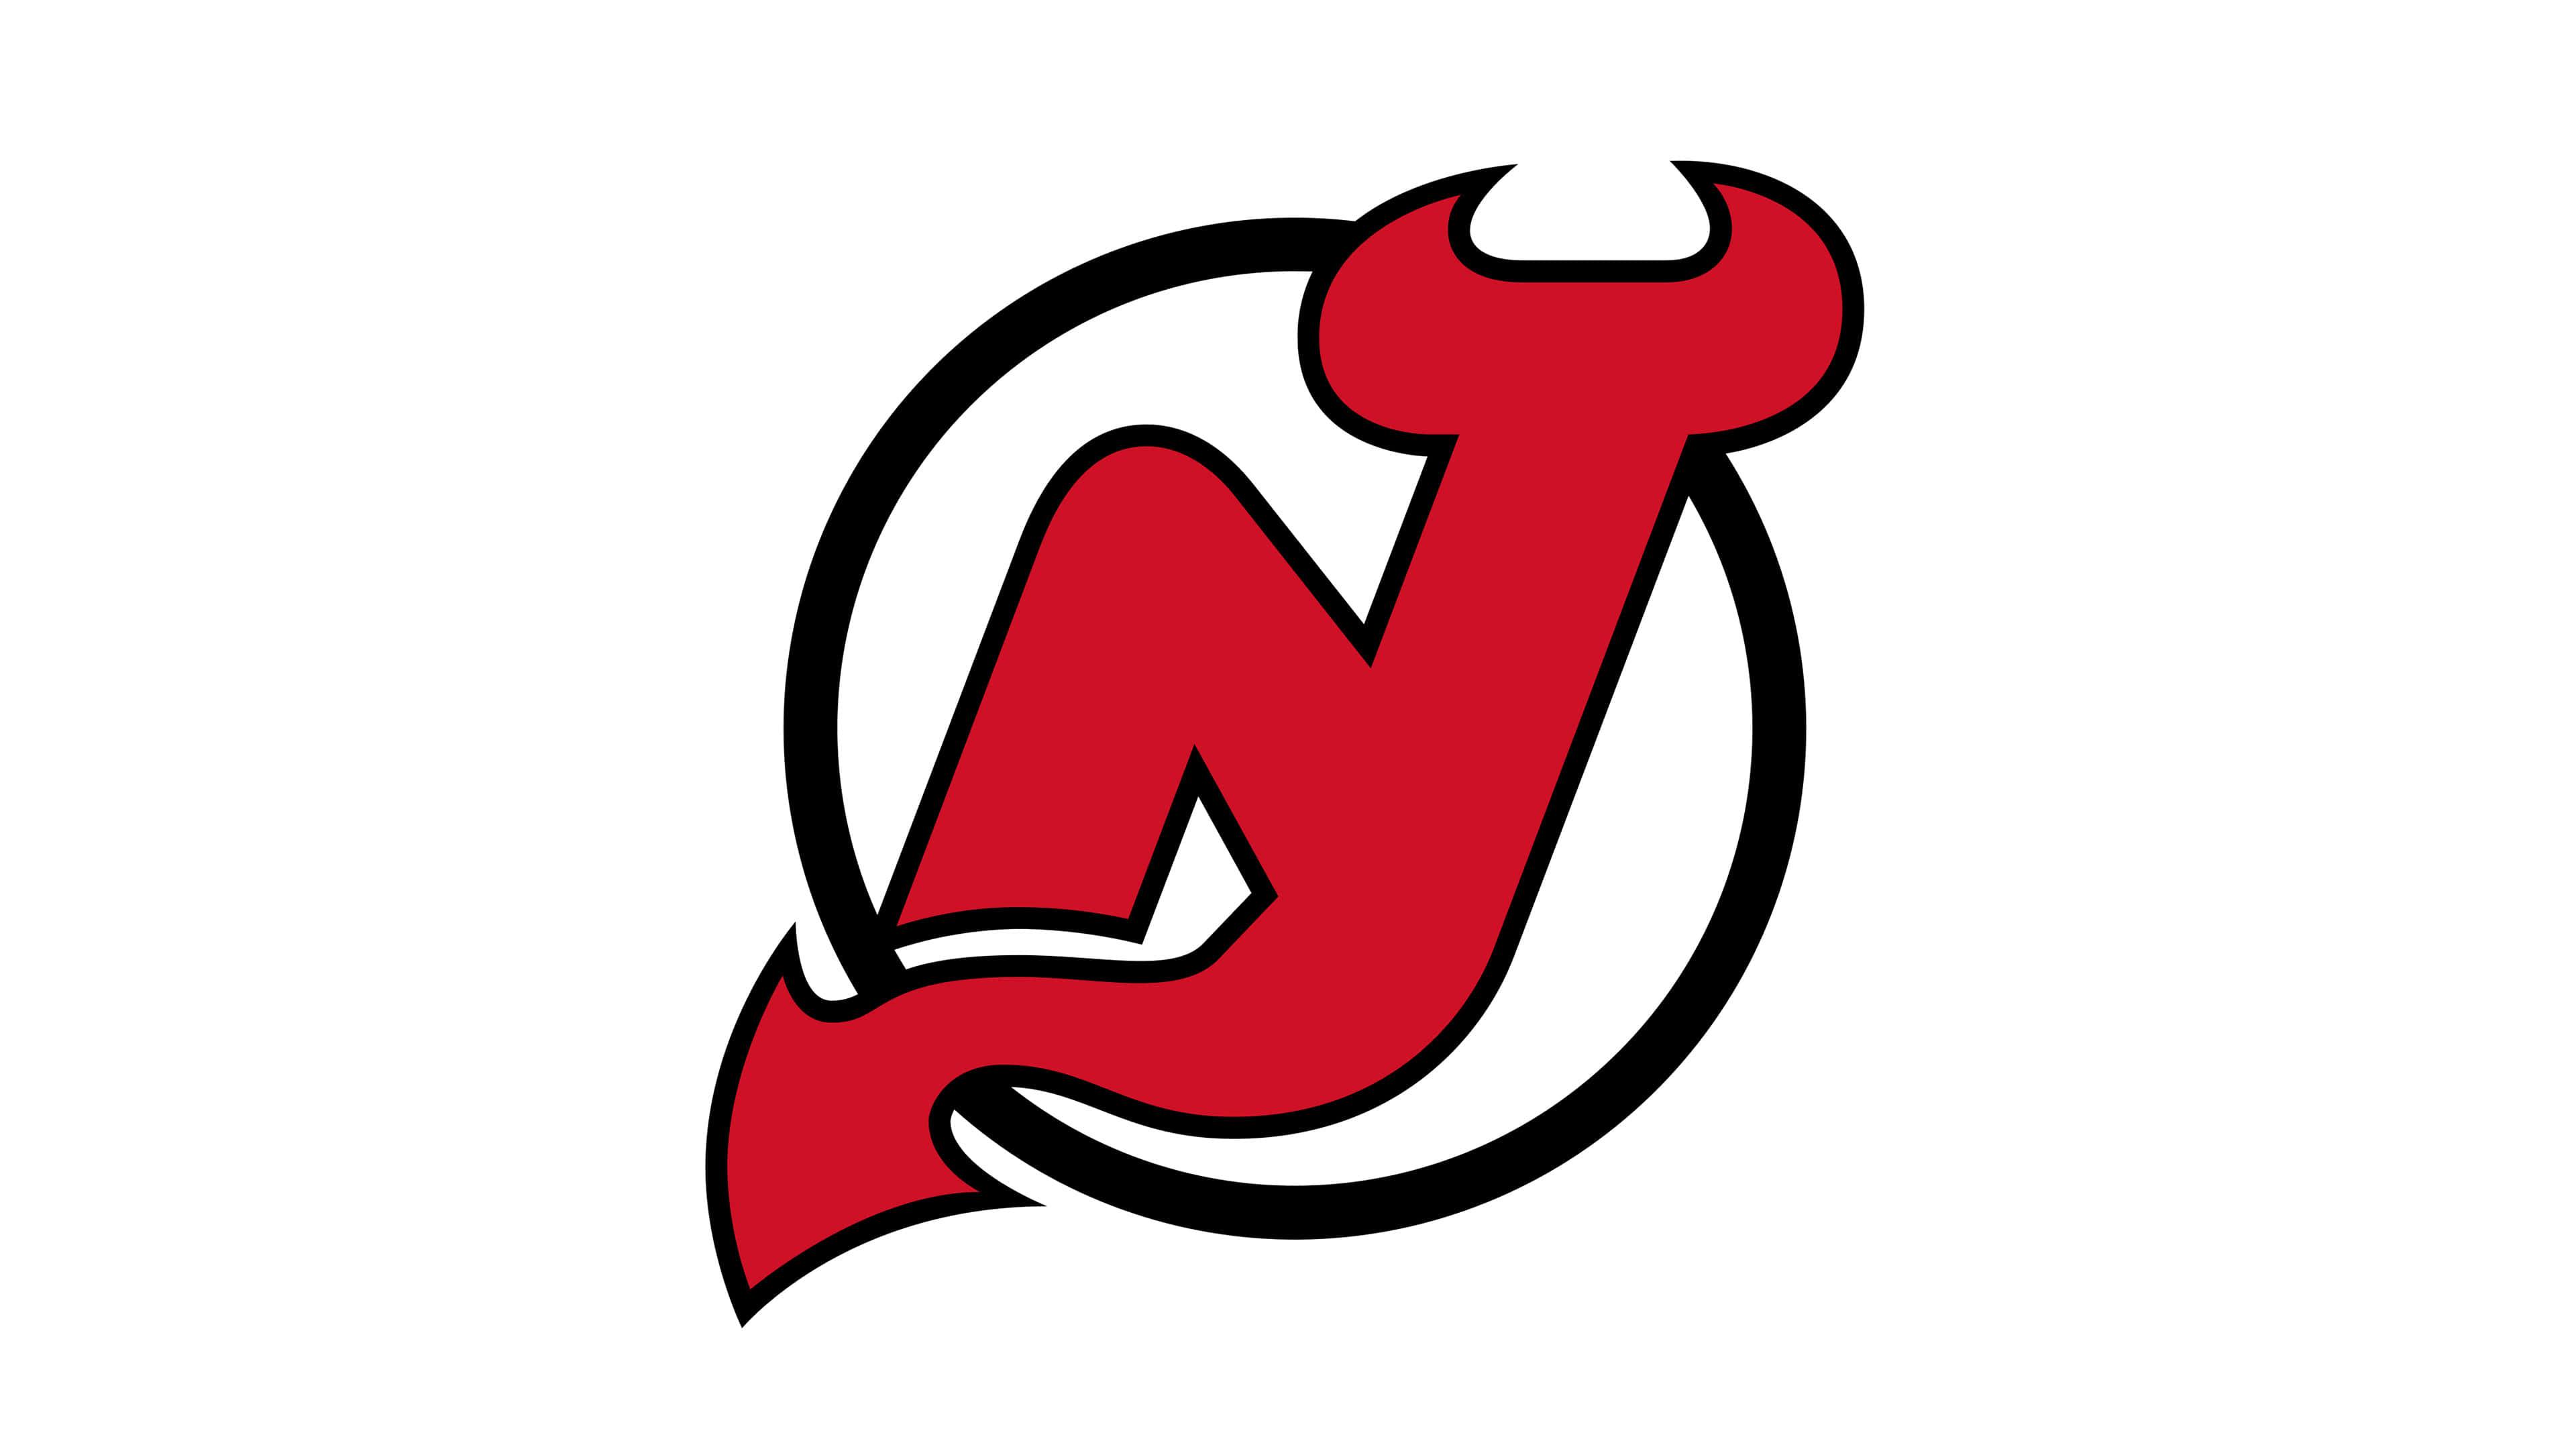 new arrival 73cca 78717 New Jersey Devils NHL Logo UHD 4K Wallpaper | Pixelz